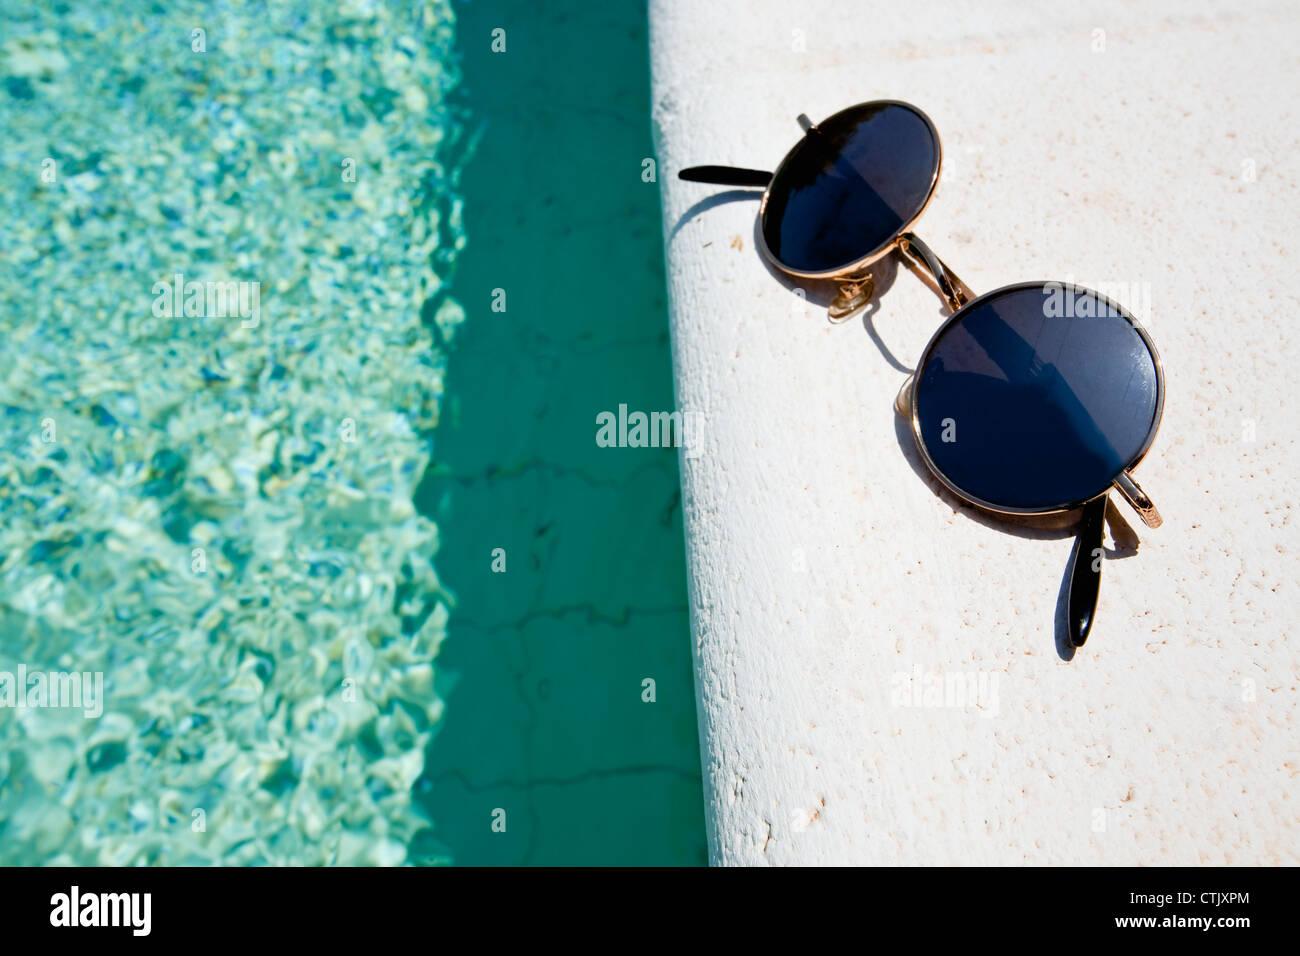 52674b1783b Black Round Sunglasses Stock Photos   Black Round Sunglasses Stock ...